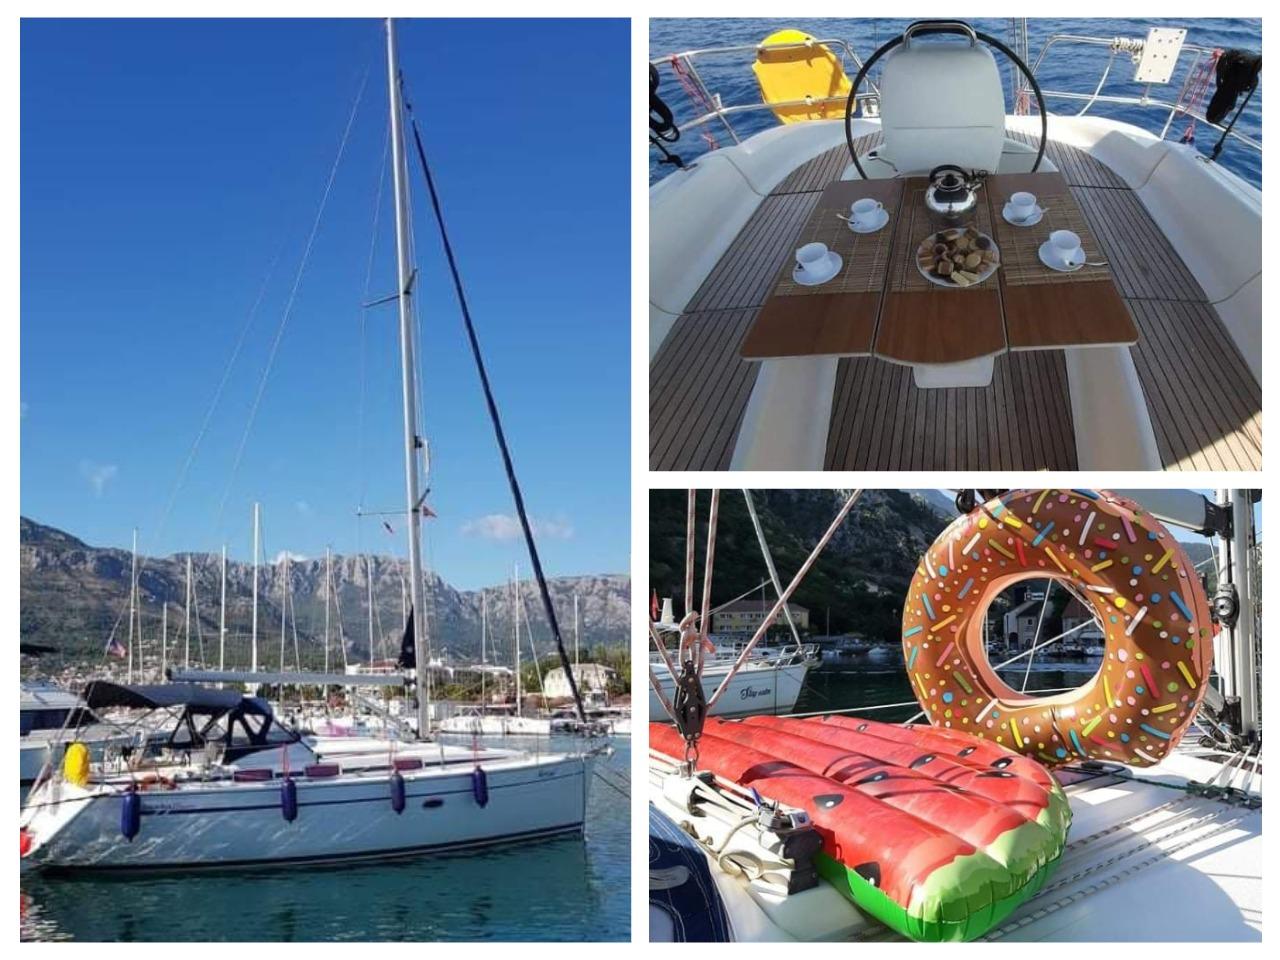 арендовать яхту в городе Бар Черногория фото цена